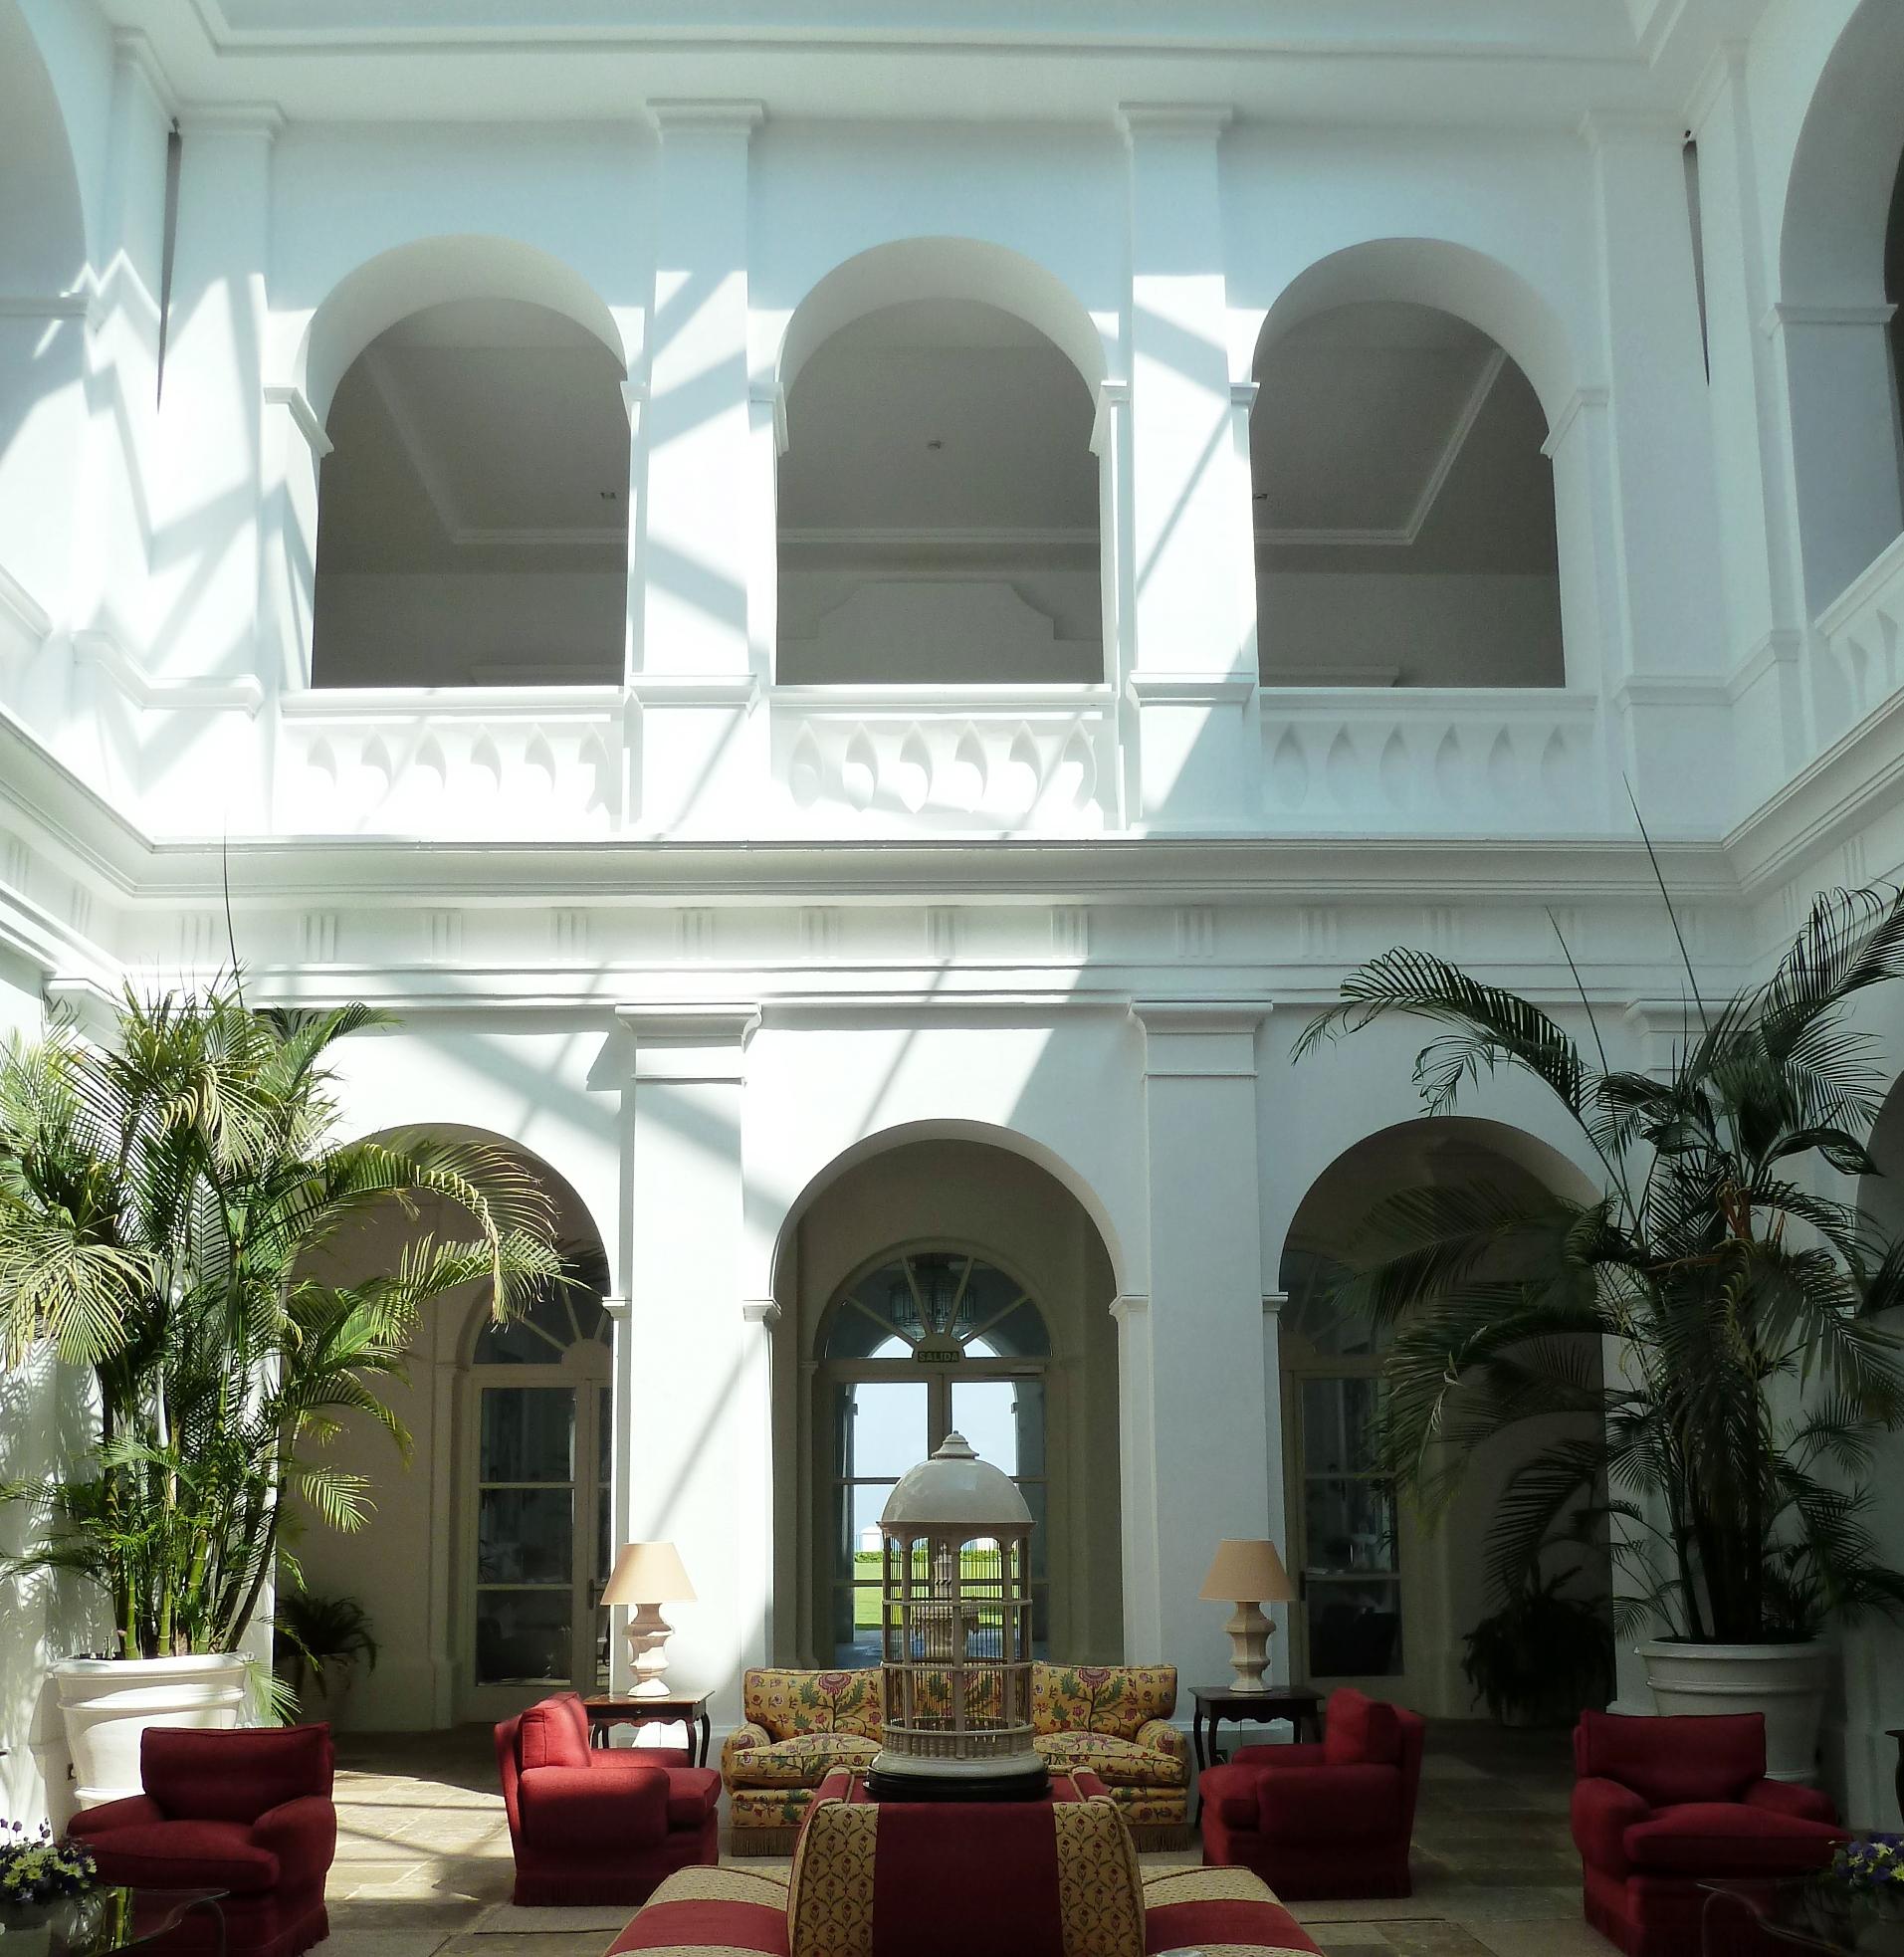 Patio_Hotel_Finca_Cortesin_Casares_copyright_www.andrewforbes.com